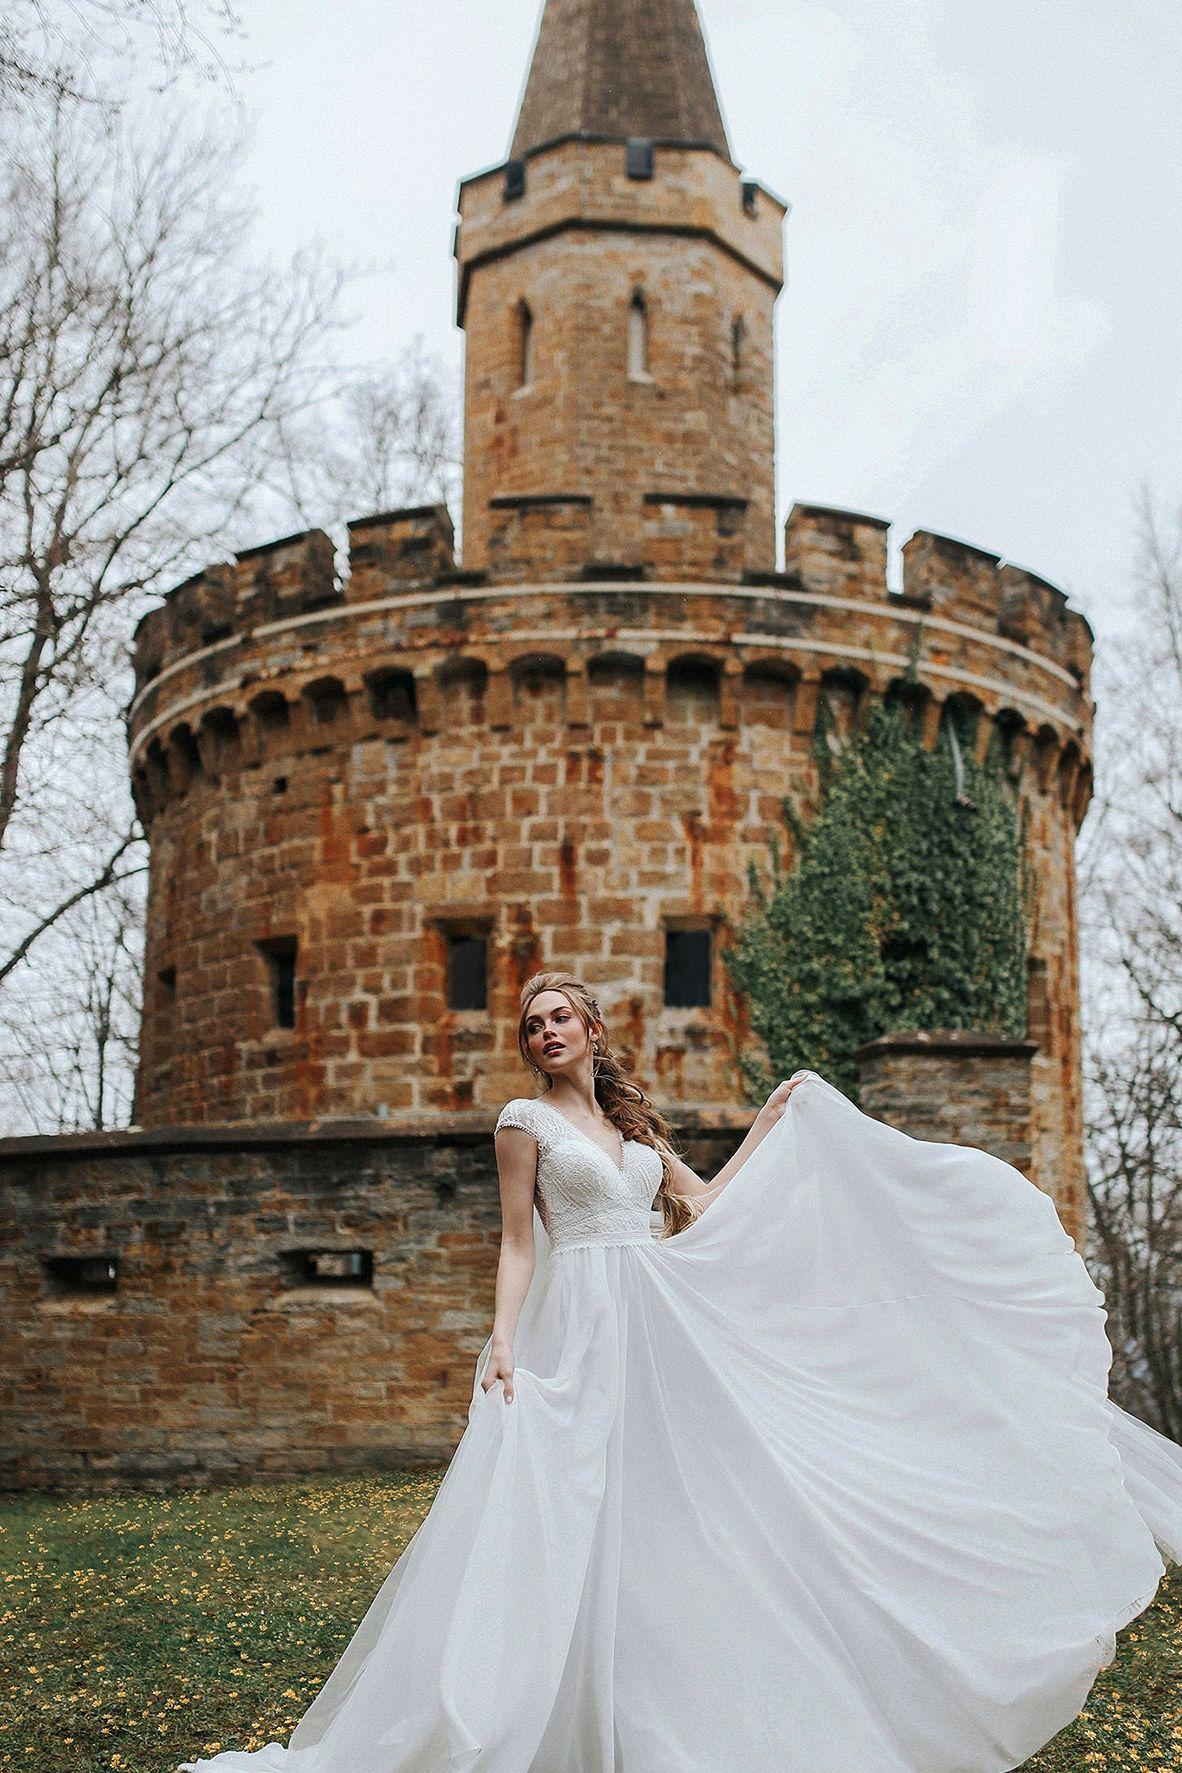 New Attract Bridals Assortment Impressed By Disney Princesses Swanky Wedding Disney Wedding Dresses Rapunzel Wedding Dress Disney Fairy Tale Weddings [ 1773 x 1182 Pixel ]